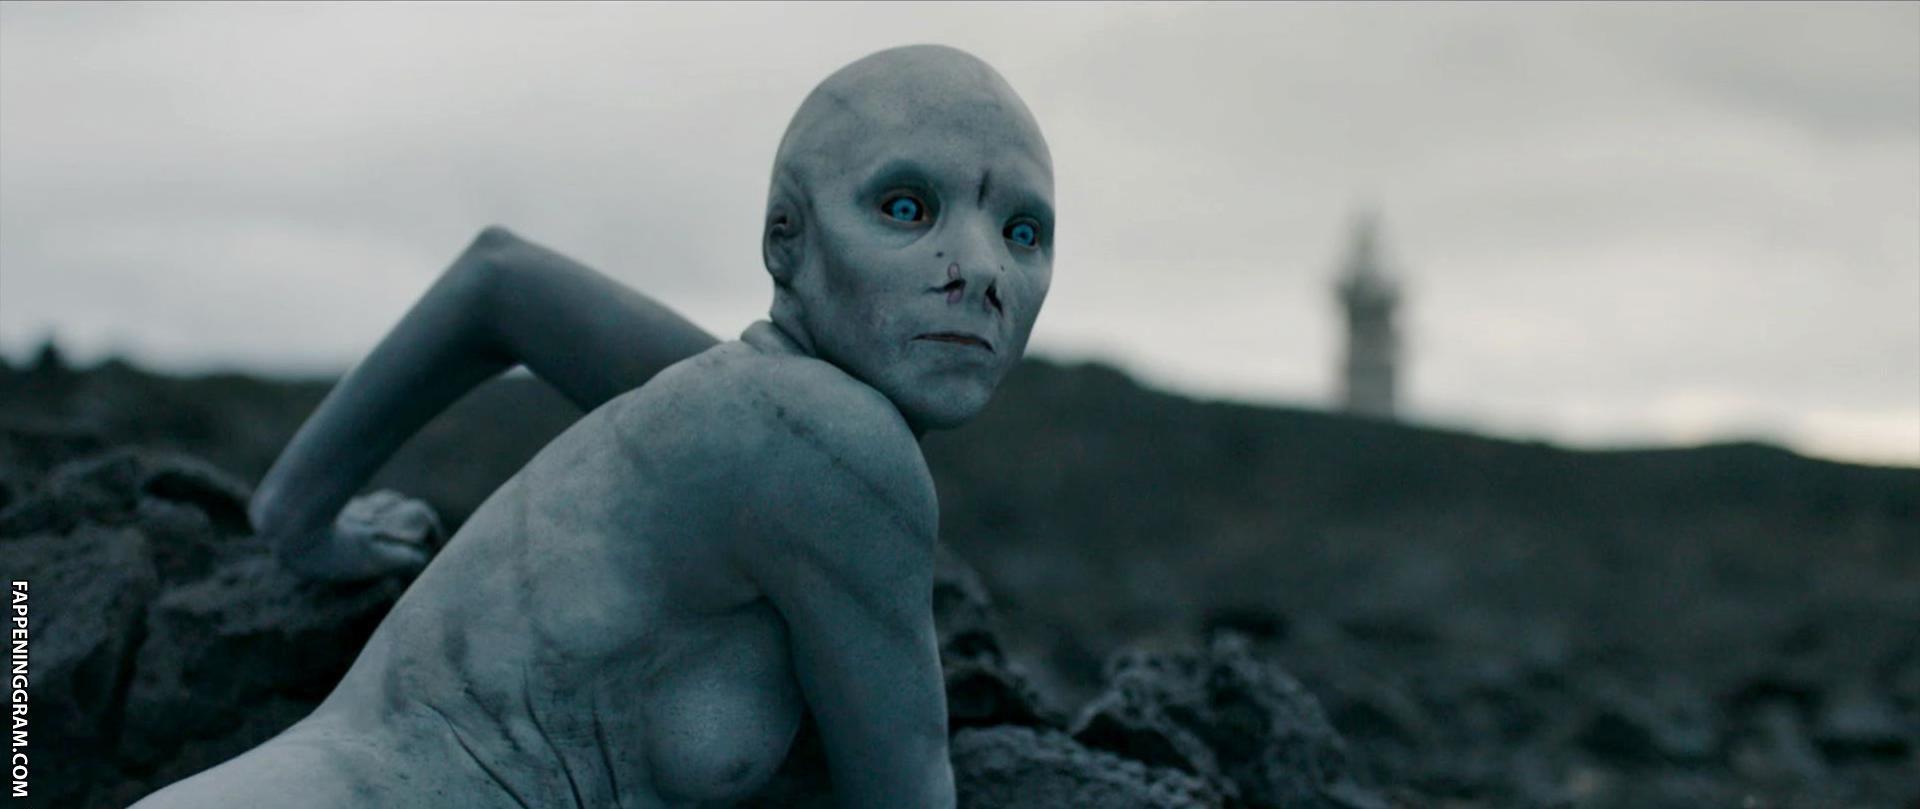 Aura Garrido Nude aura garrido nude the fappening - fappeninggram